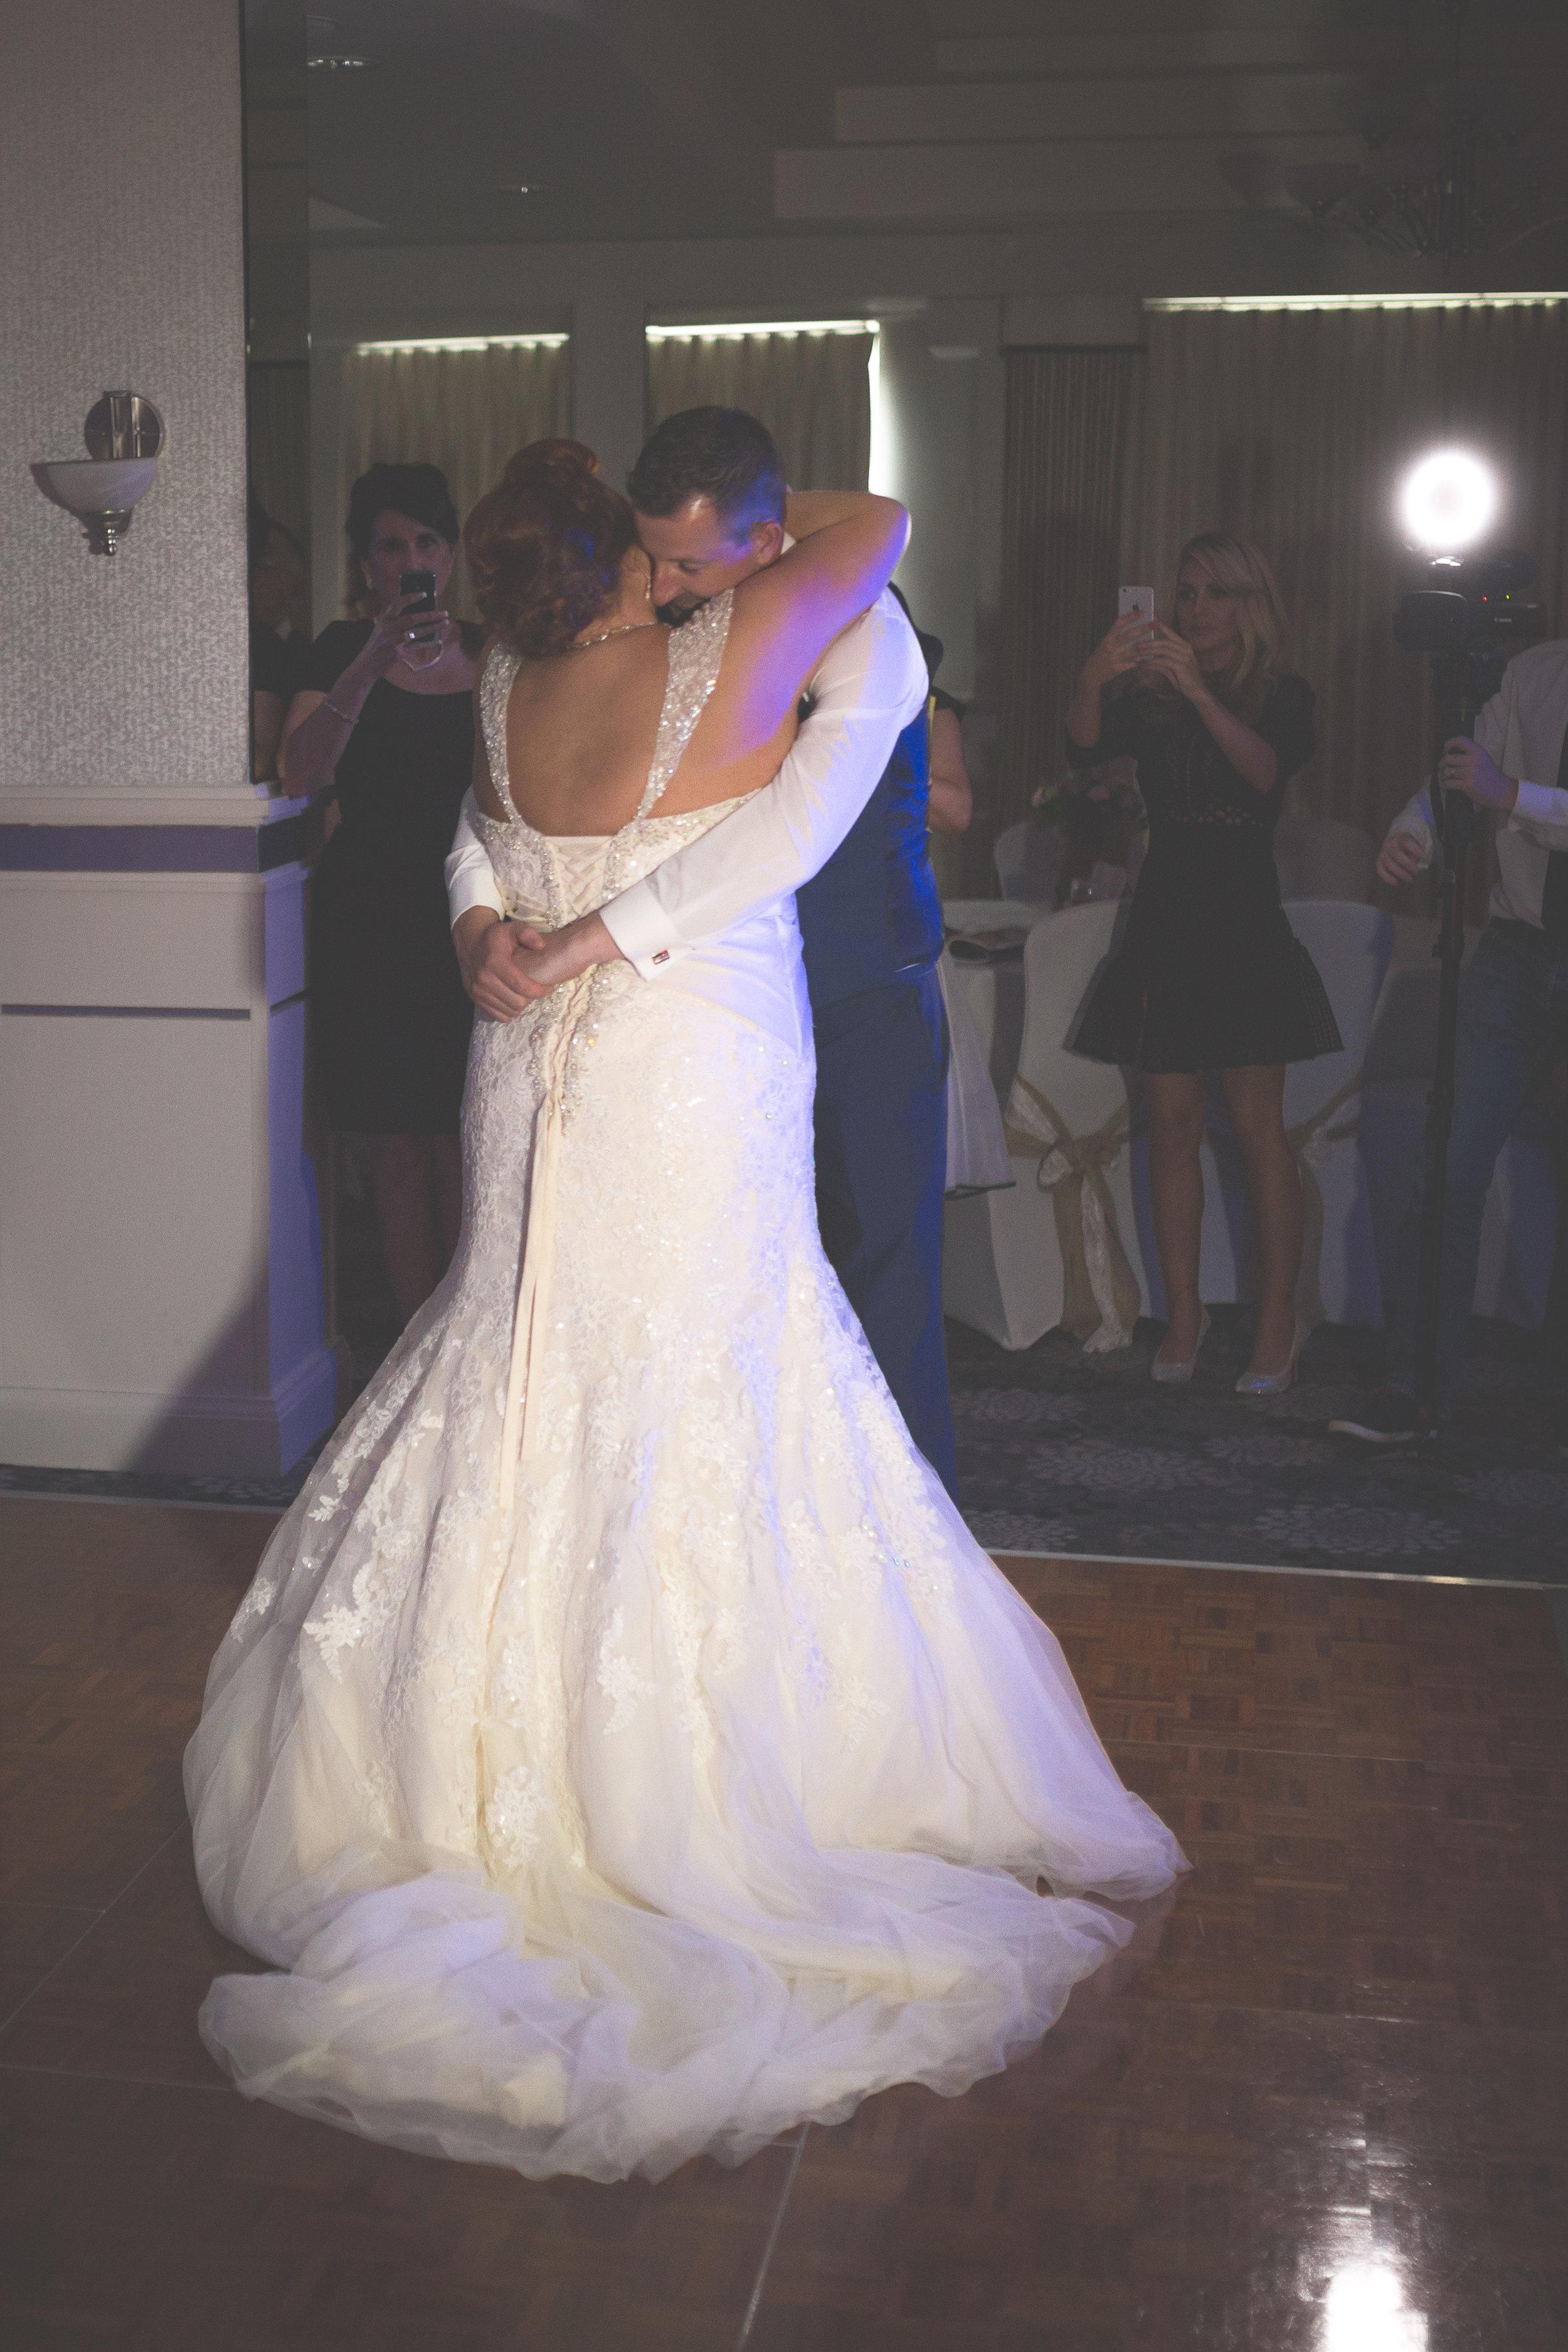 Antoinette & Stephen - First Dance | Brian McEwan Photography | Wedding Photographer Northern Ireland 5.jpg